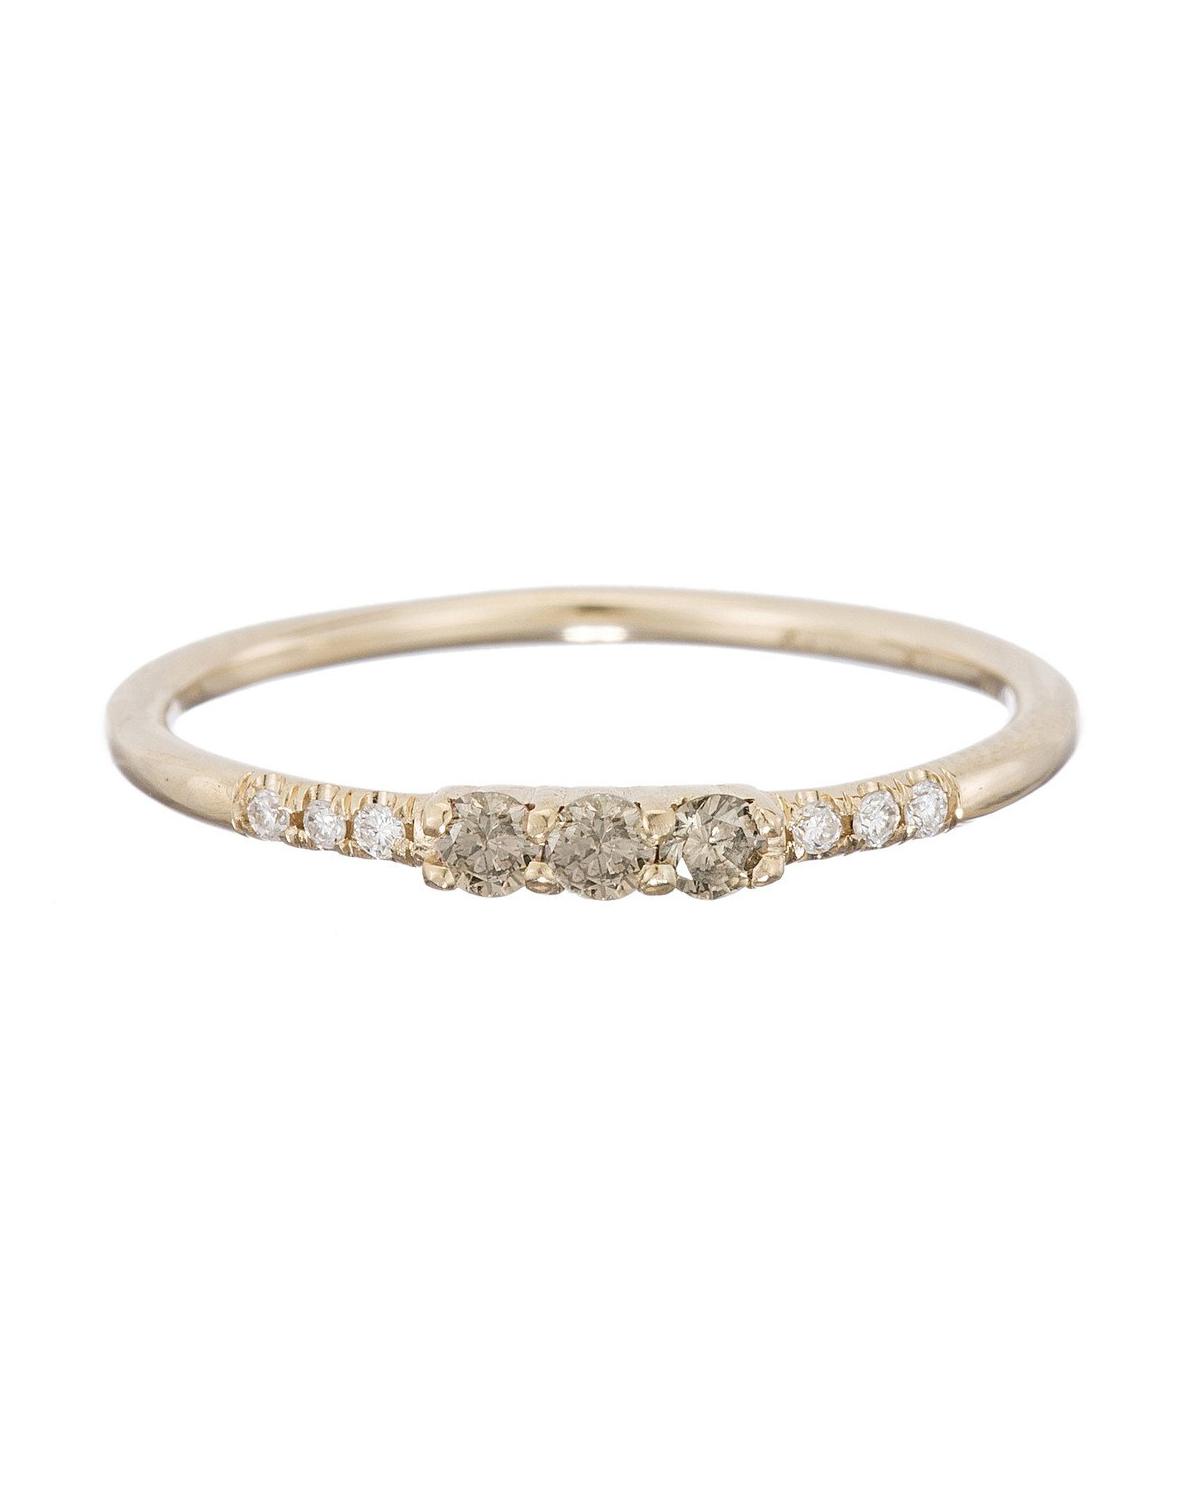 Jennie Kwon Designs Equilibrium Ring